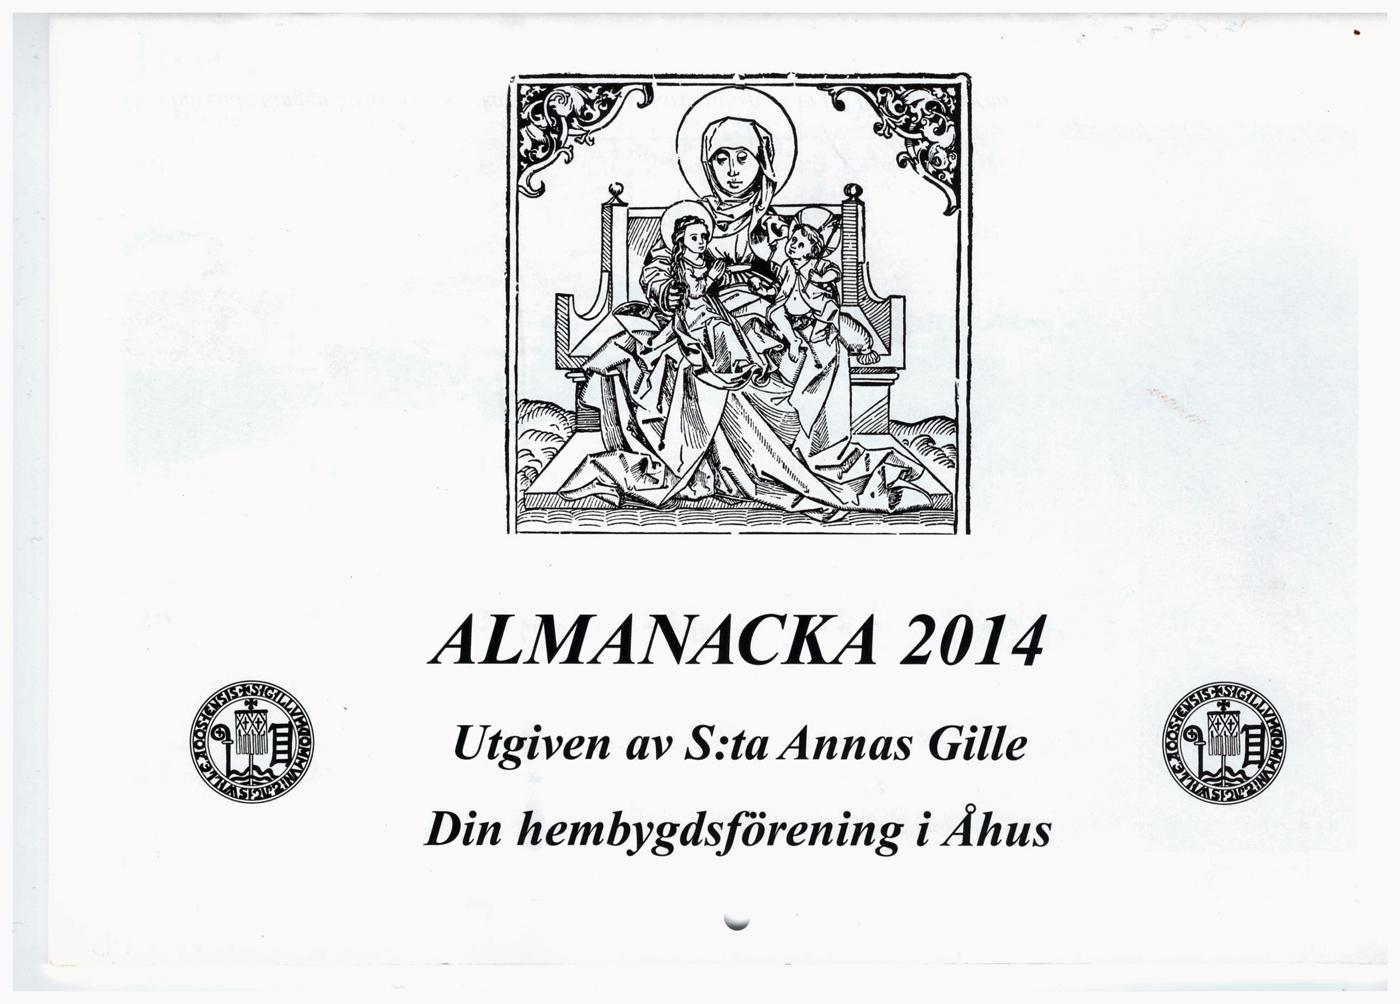 Almanacka 2014 Gamla bilder tobaksodling